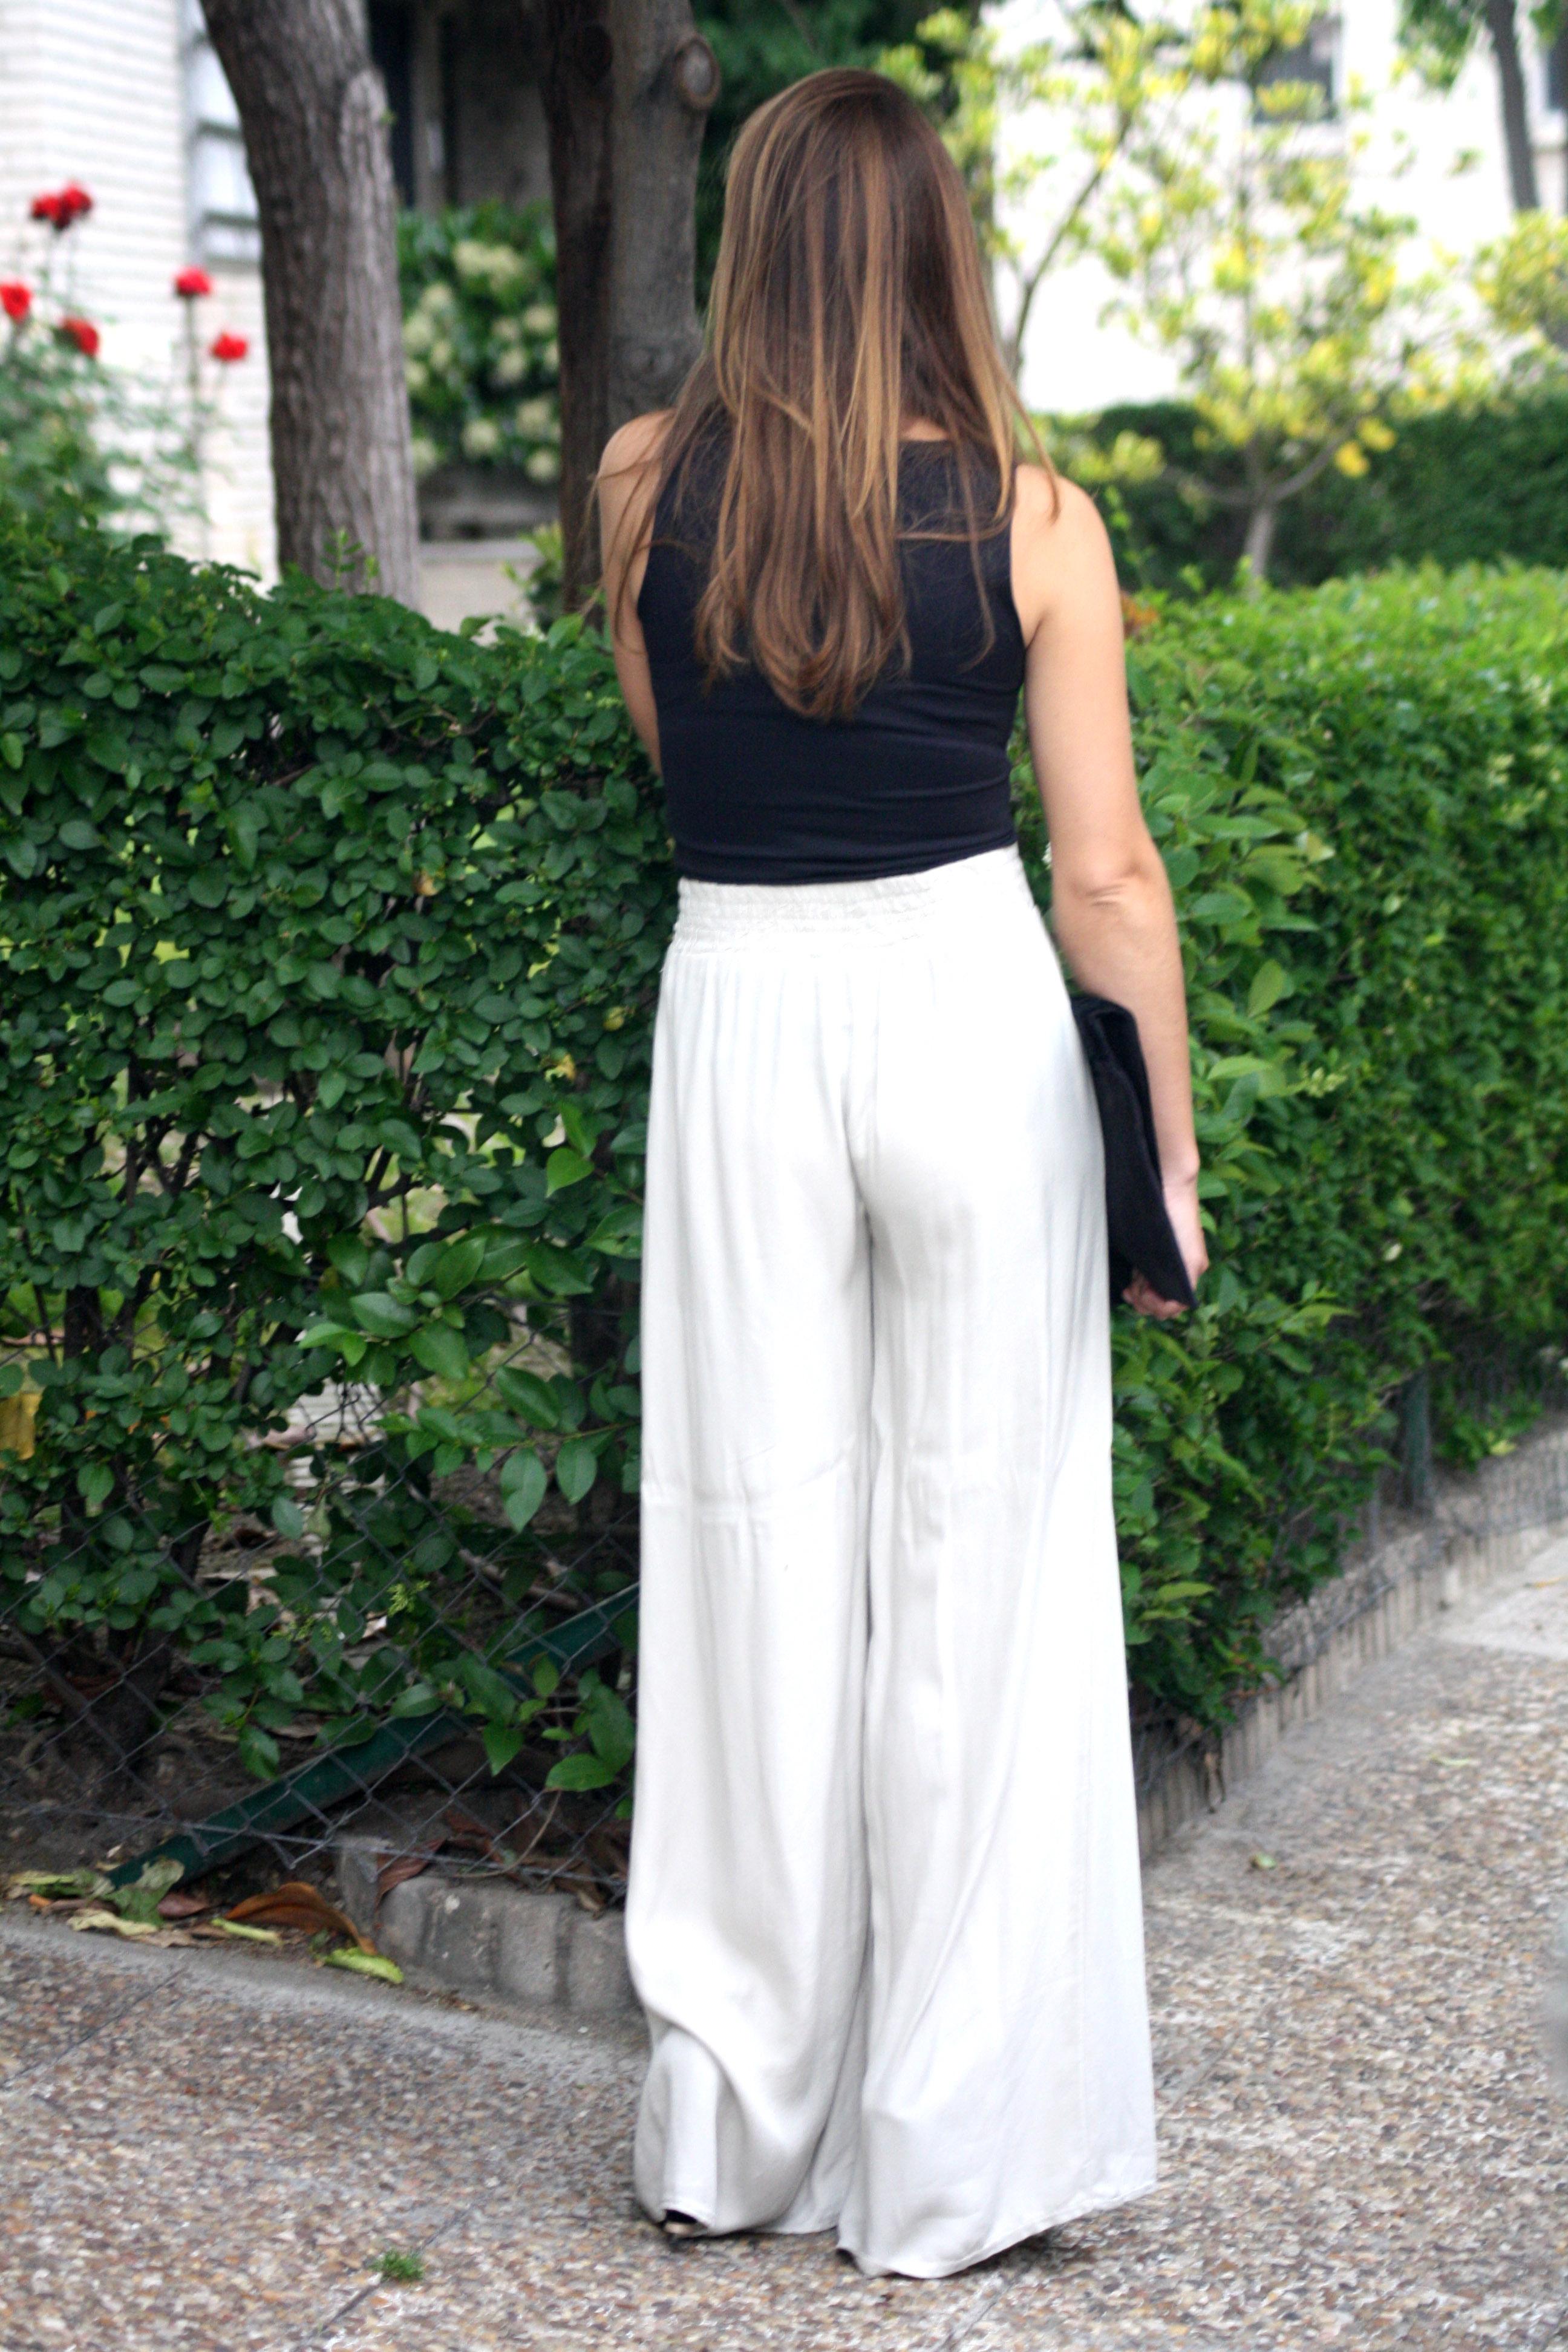 Pantalones palazzo la reina del low cost - Moda para boda ...